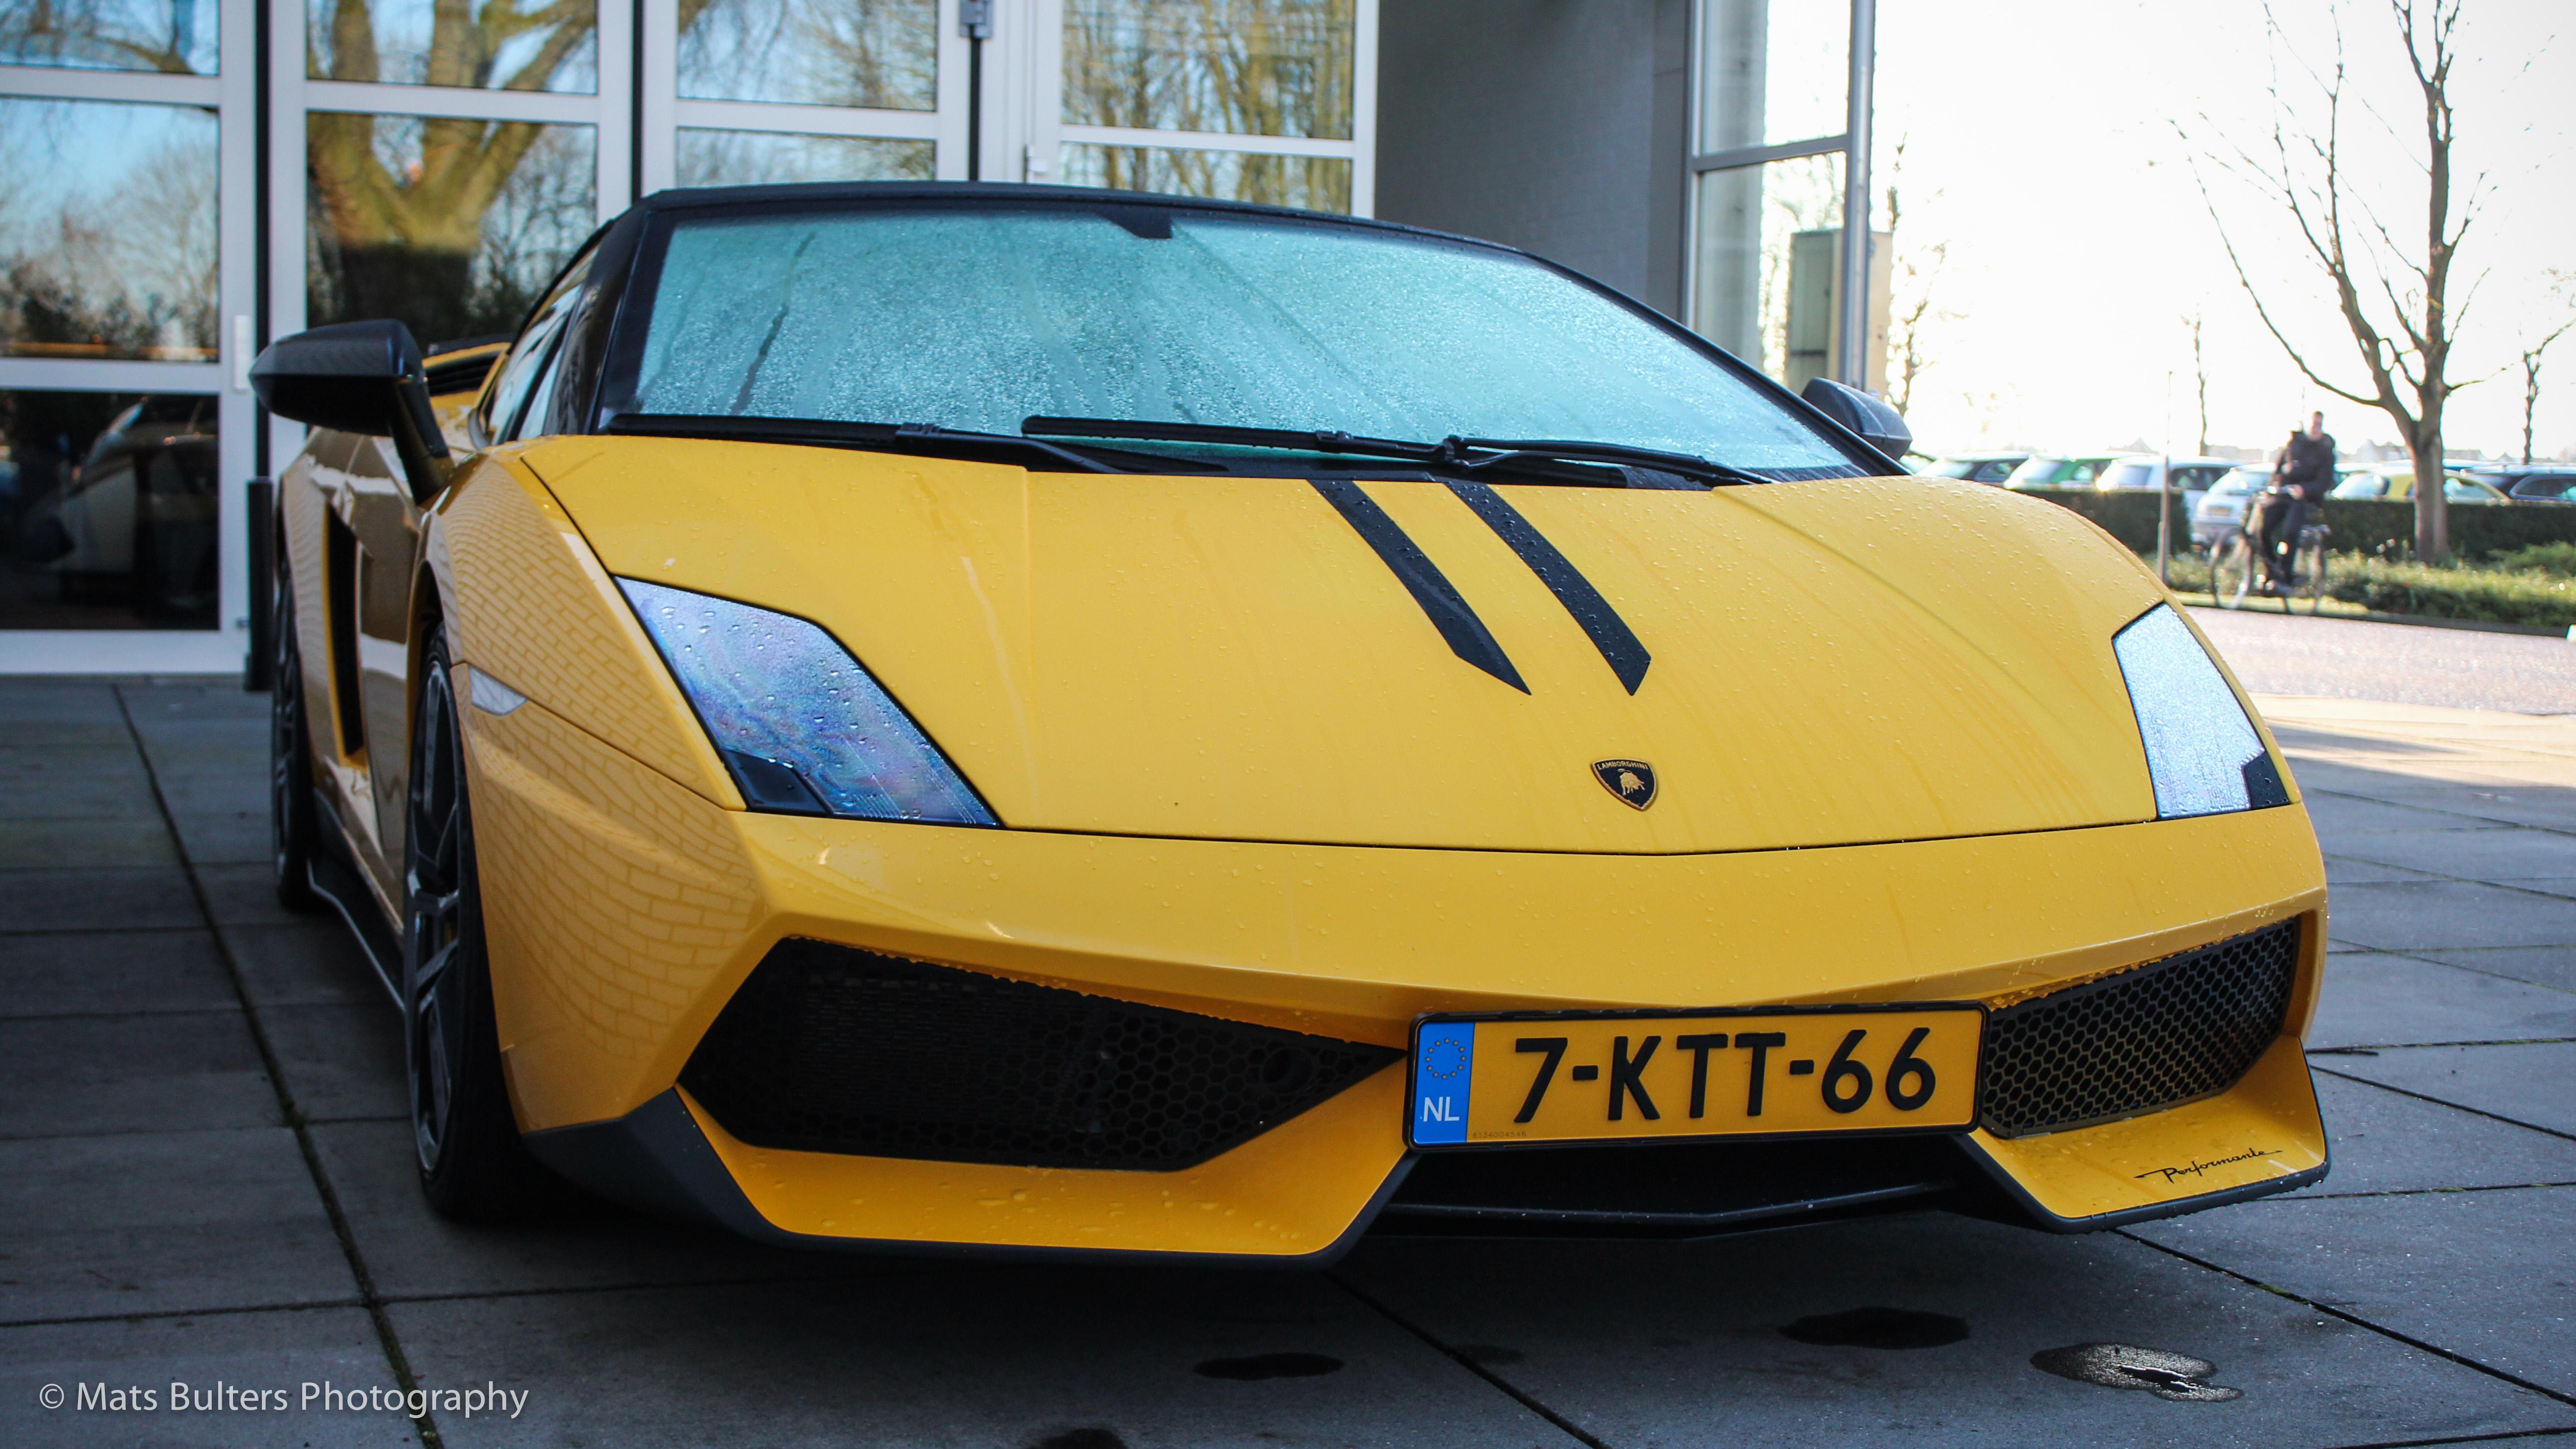 Lamborghini Gallardo LP570-4 Spyder Performante ET - www.hartvoorautos.nl